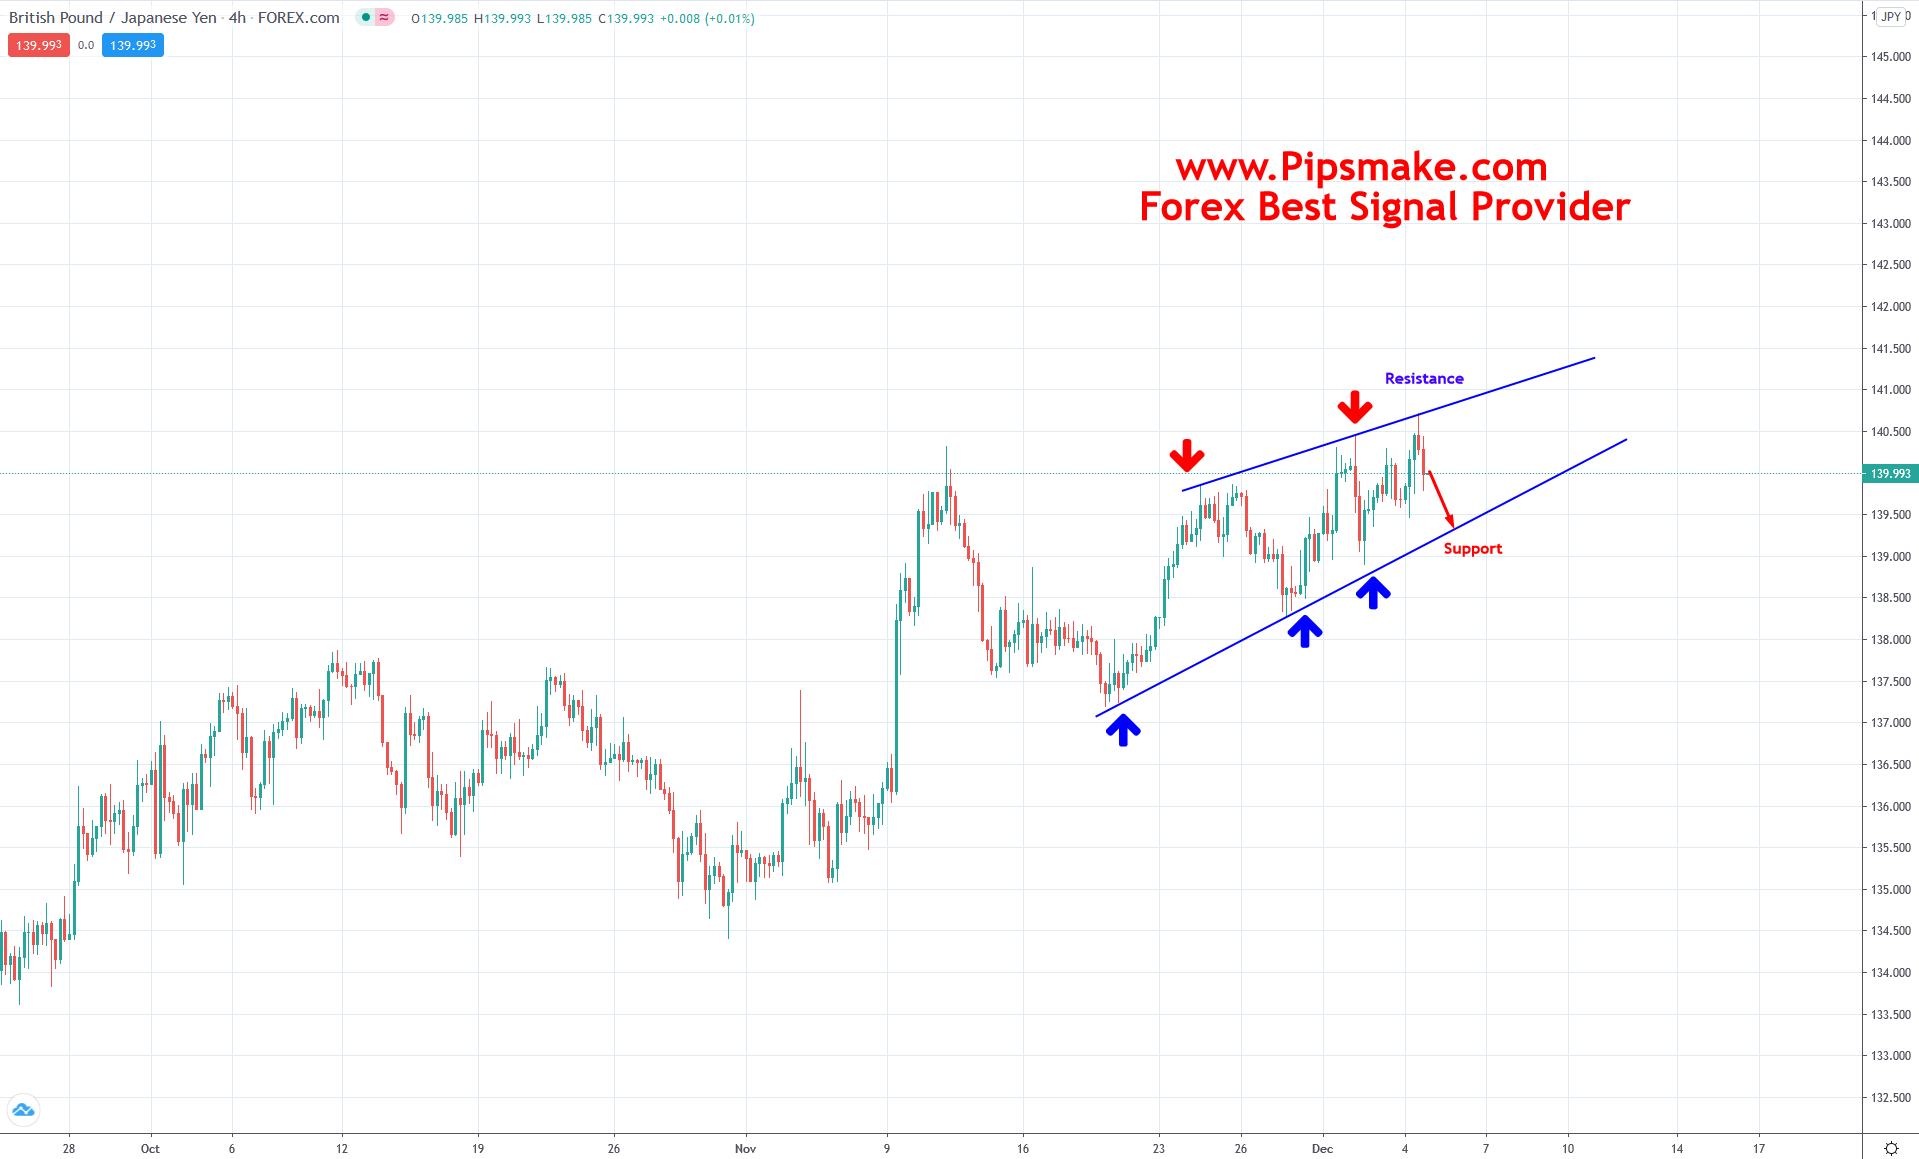 Forex Best Signal Provider